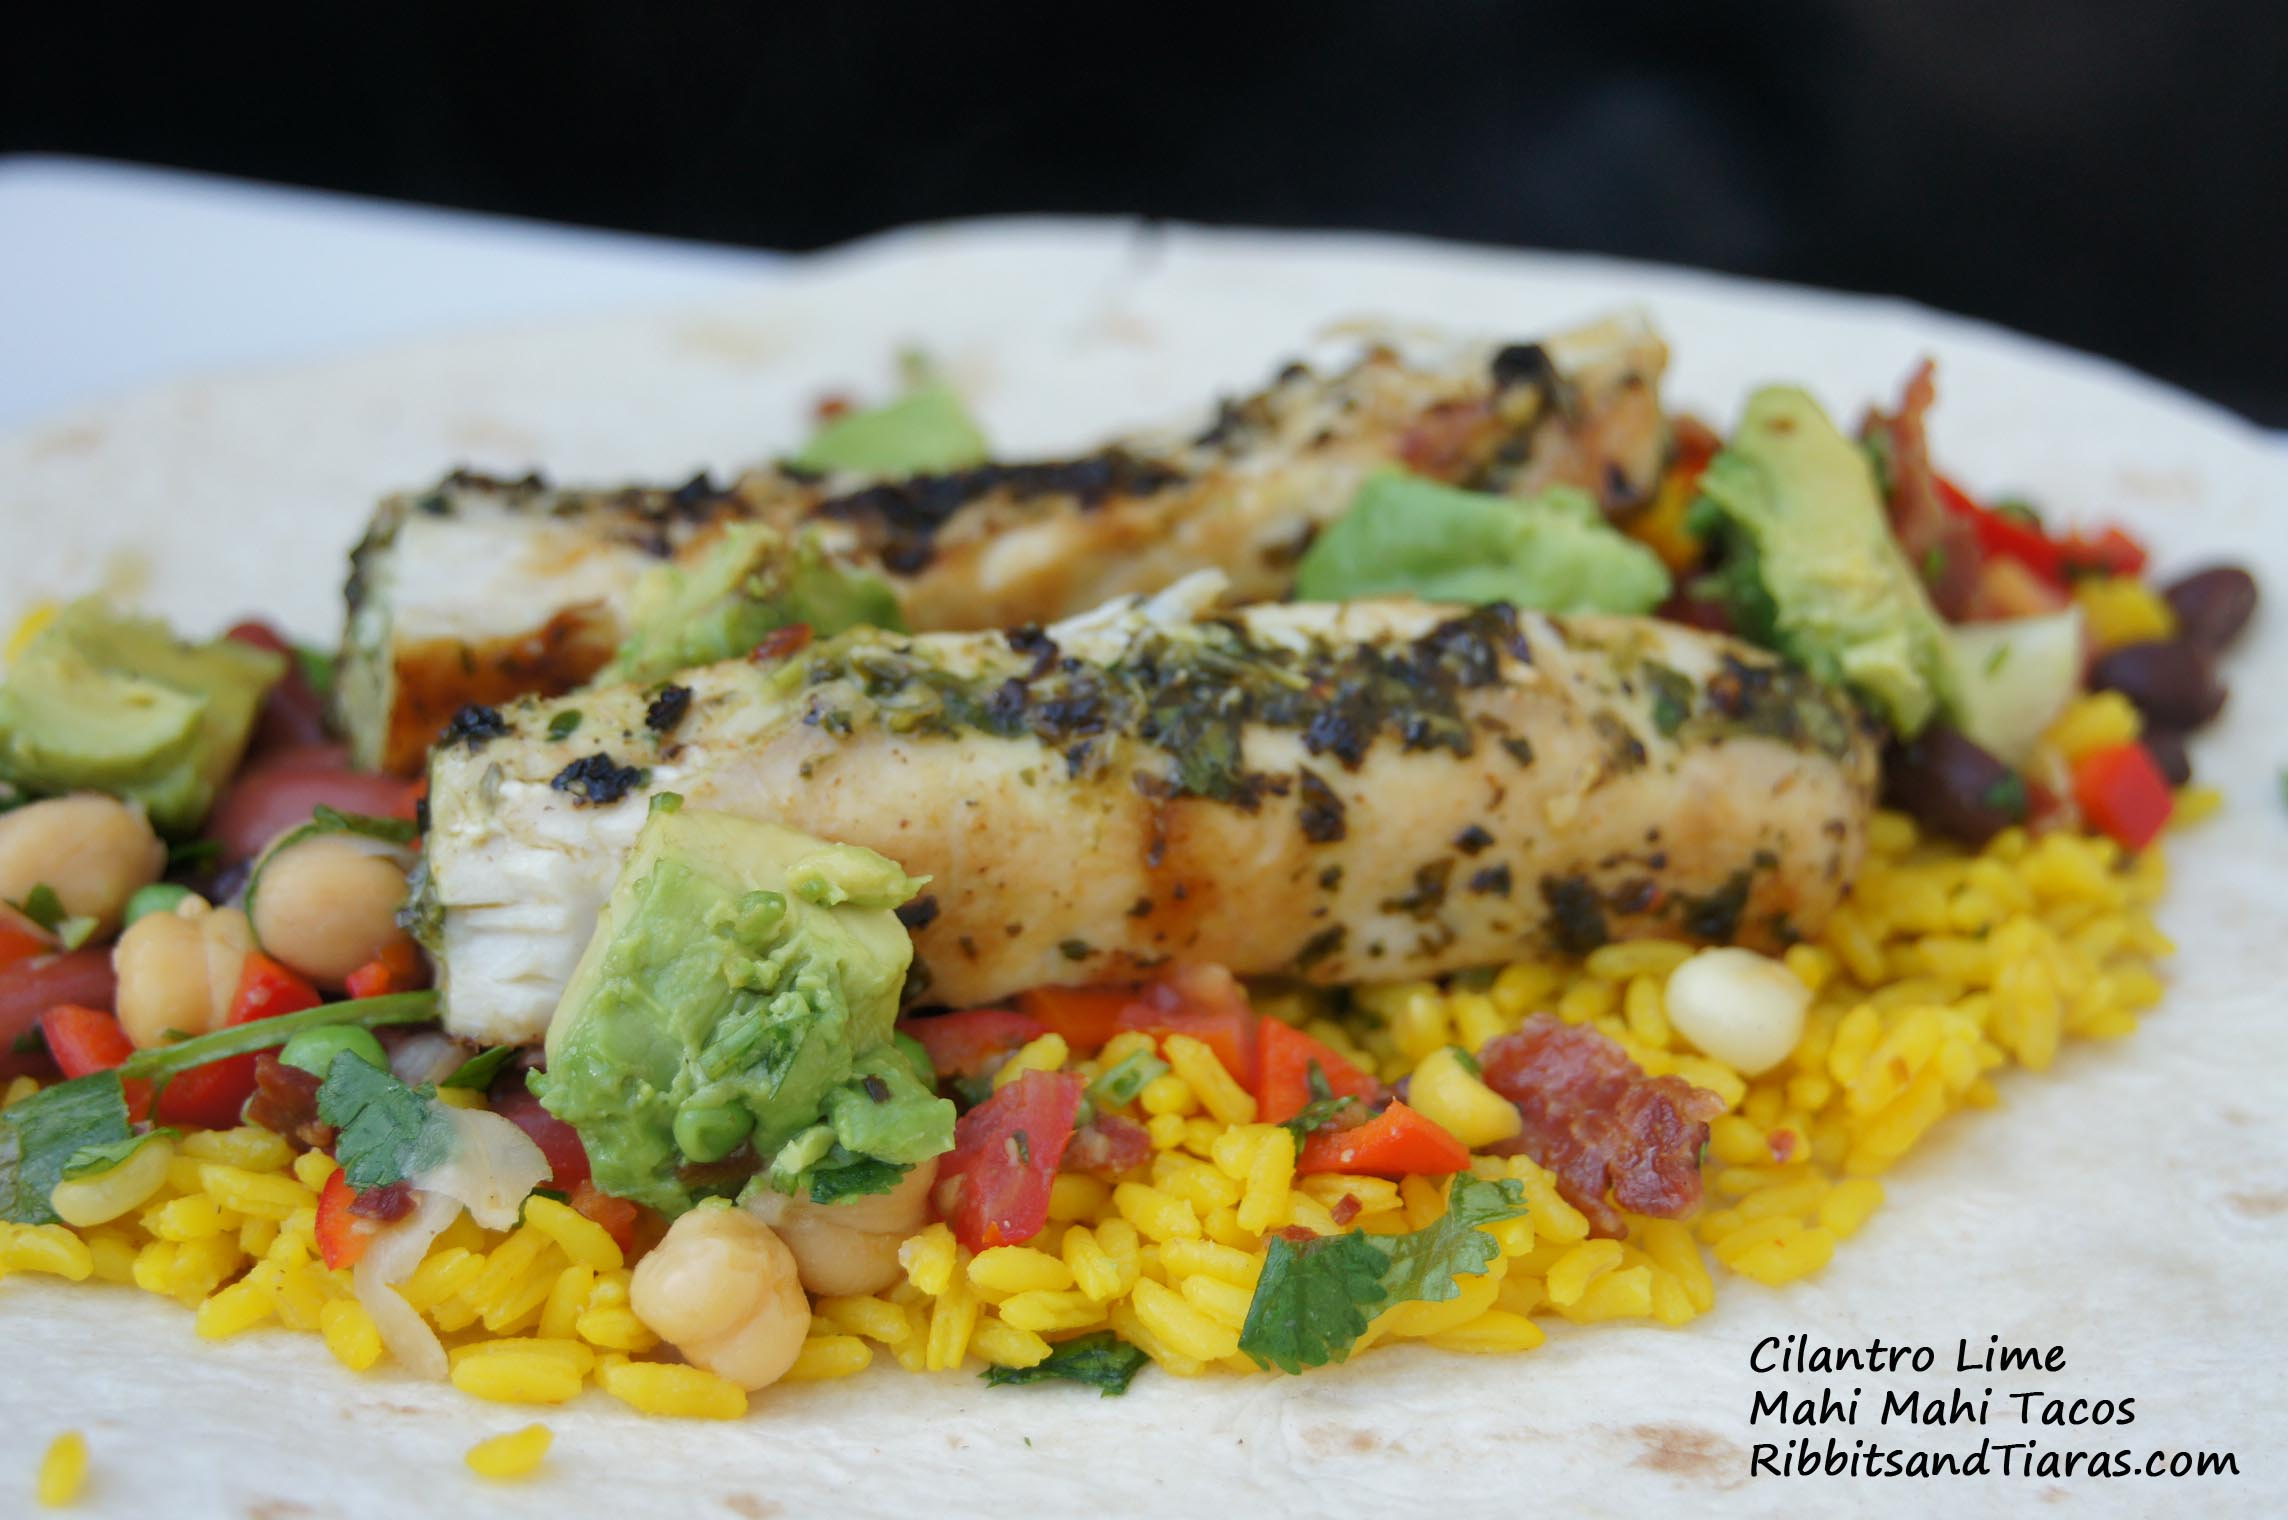 ... is for Yellow Rice and Cilantro Lime Mahi Mahi Tacos | Bits and Bytes